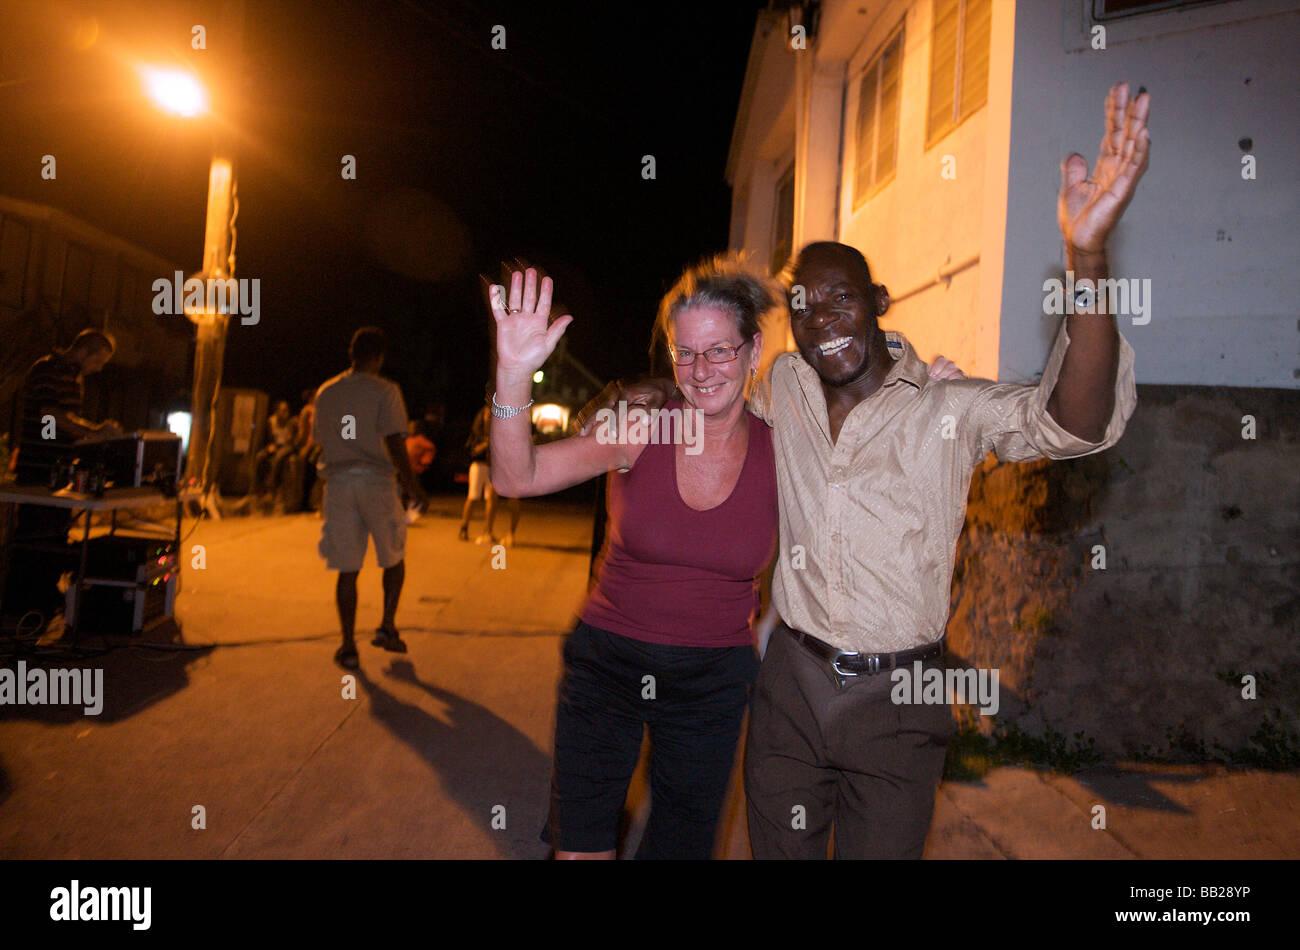 Saba the Bottom a roadblock party - Stock Image